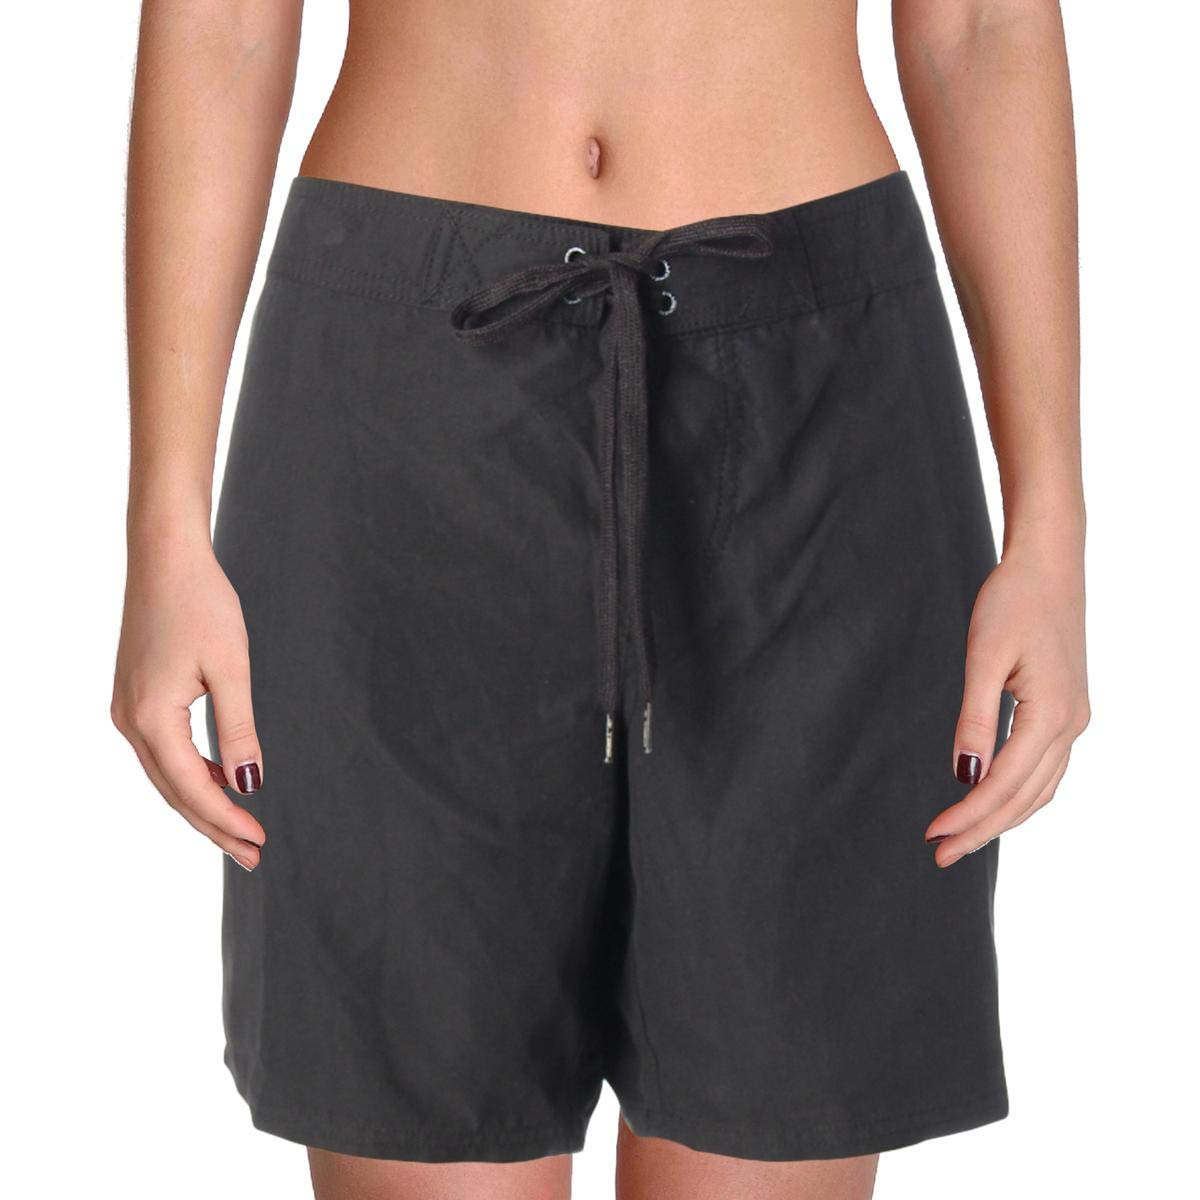 O'Neill Women's Atlantic 7 inch Boardshorts, Black, 13